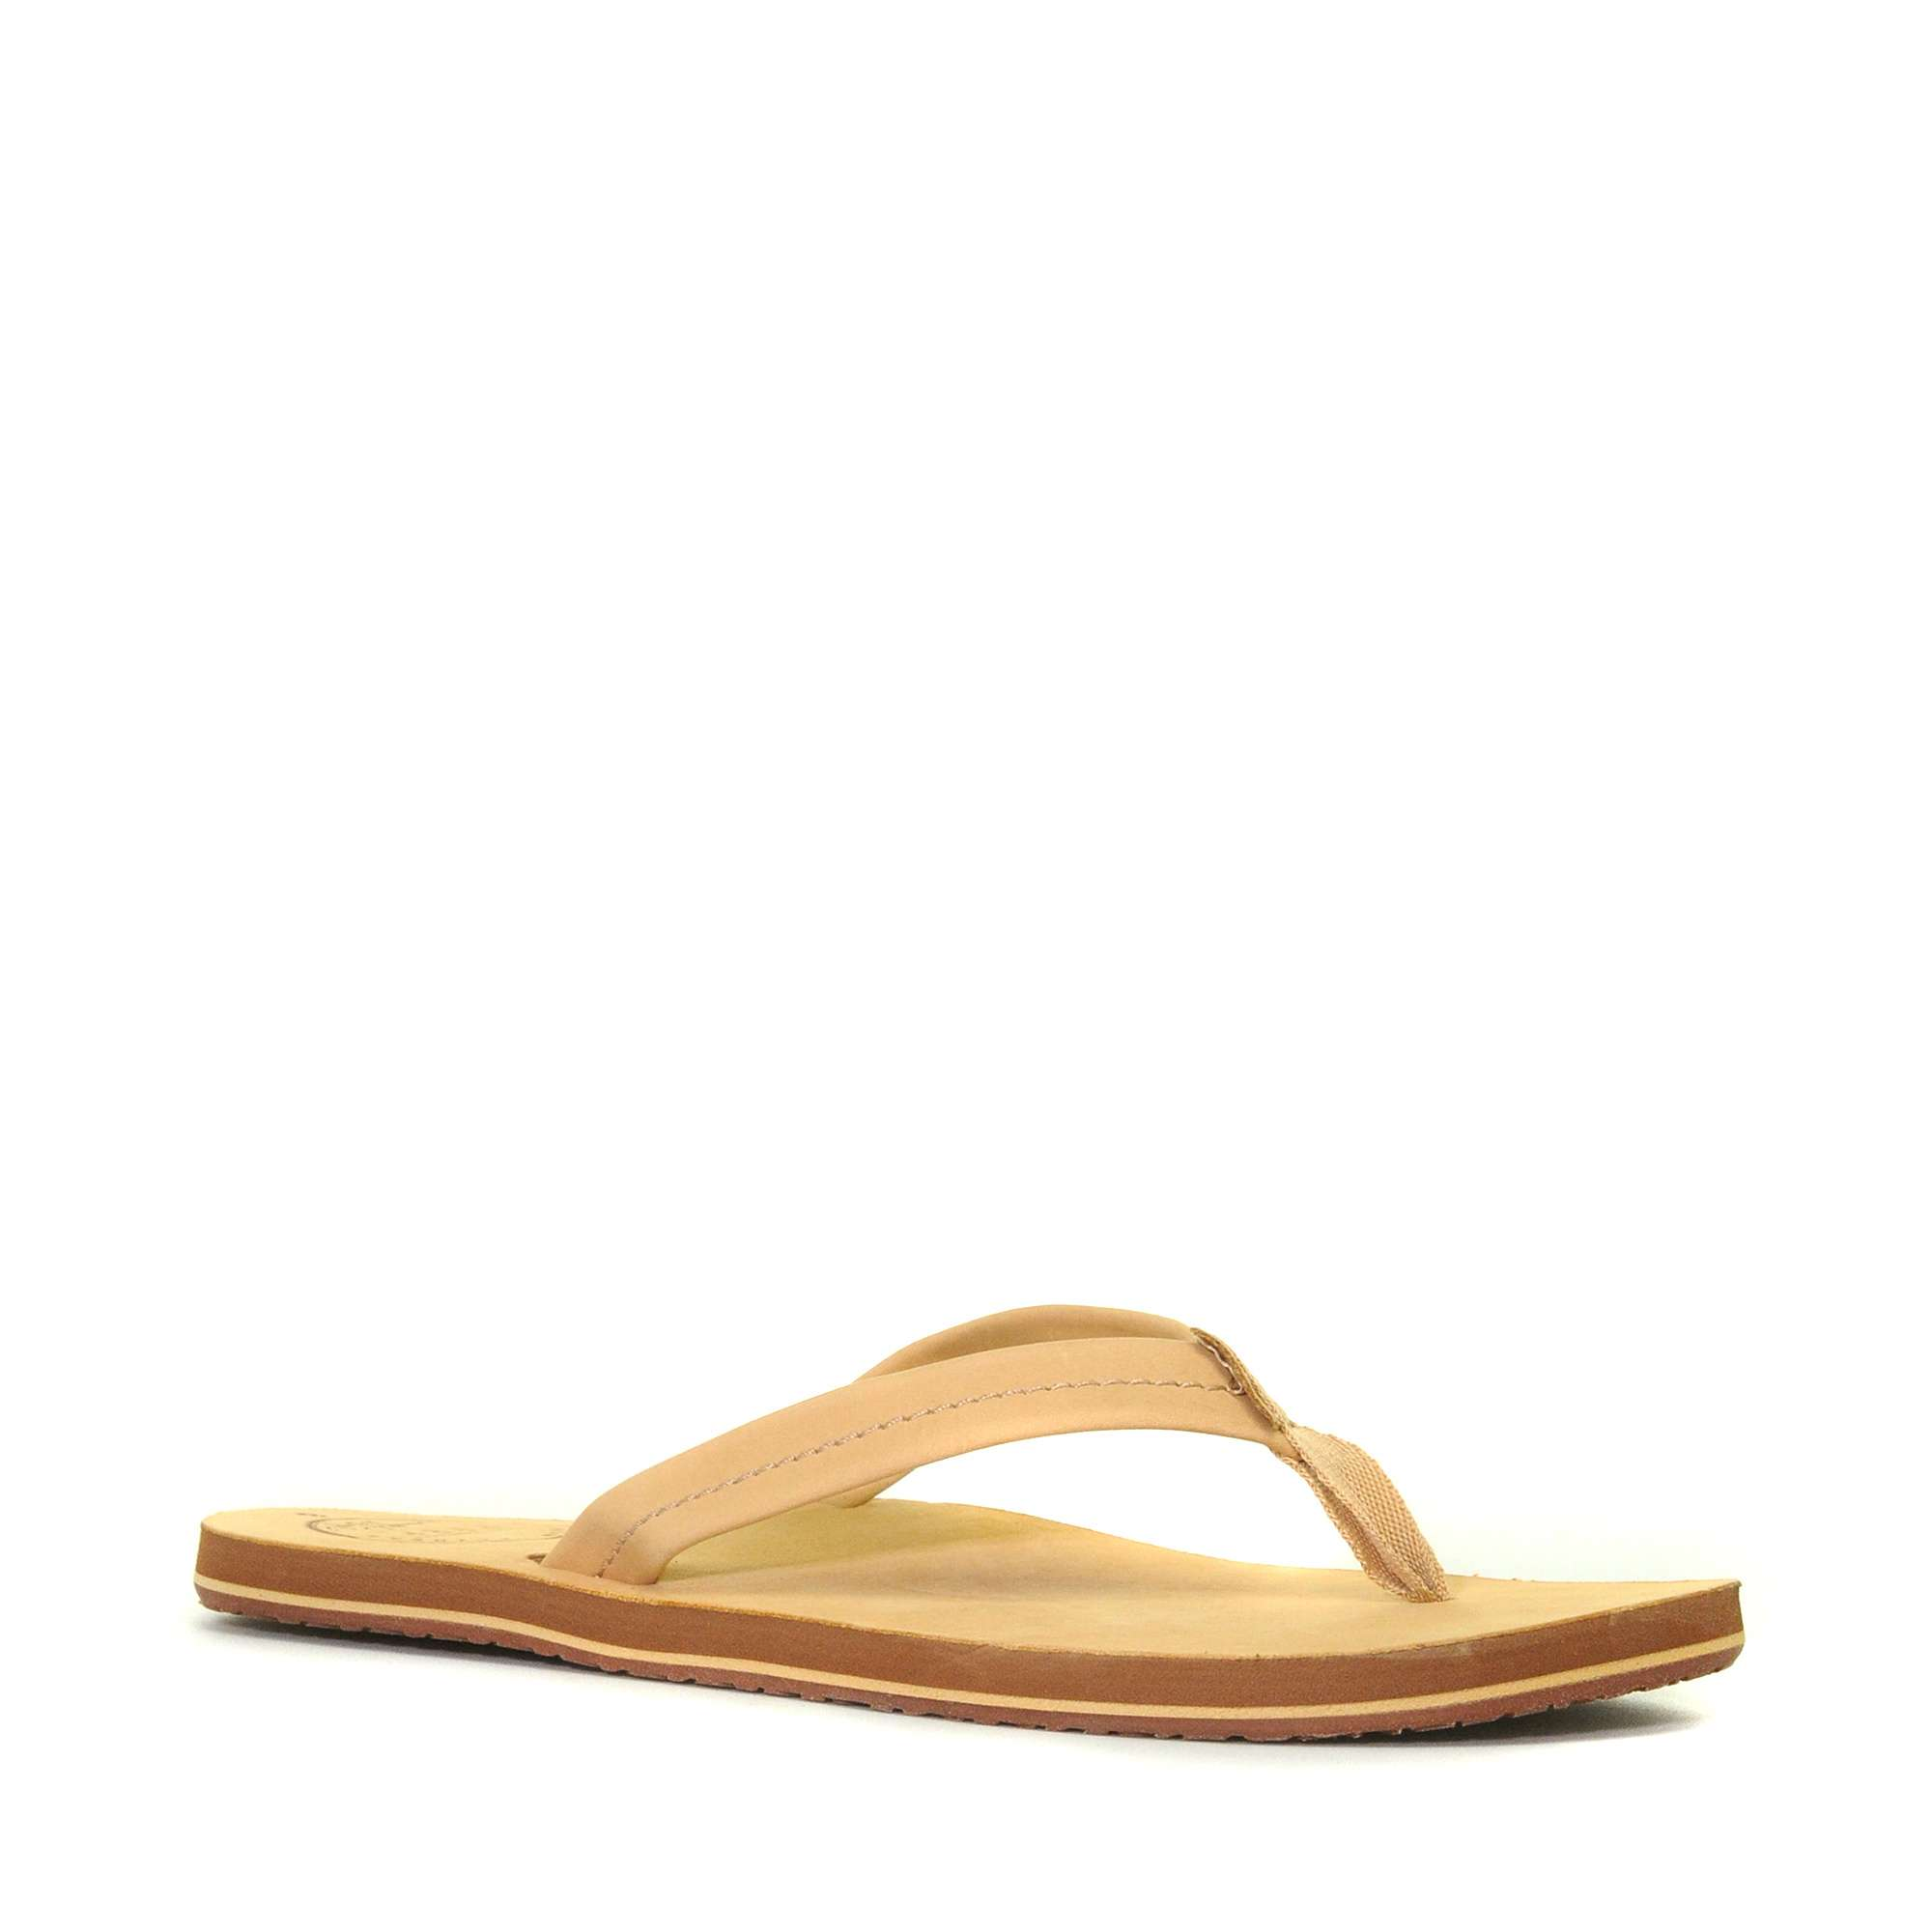 REEF Women's Chill Leather Flip Flop